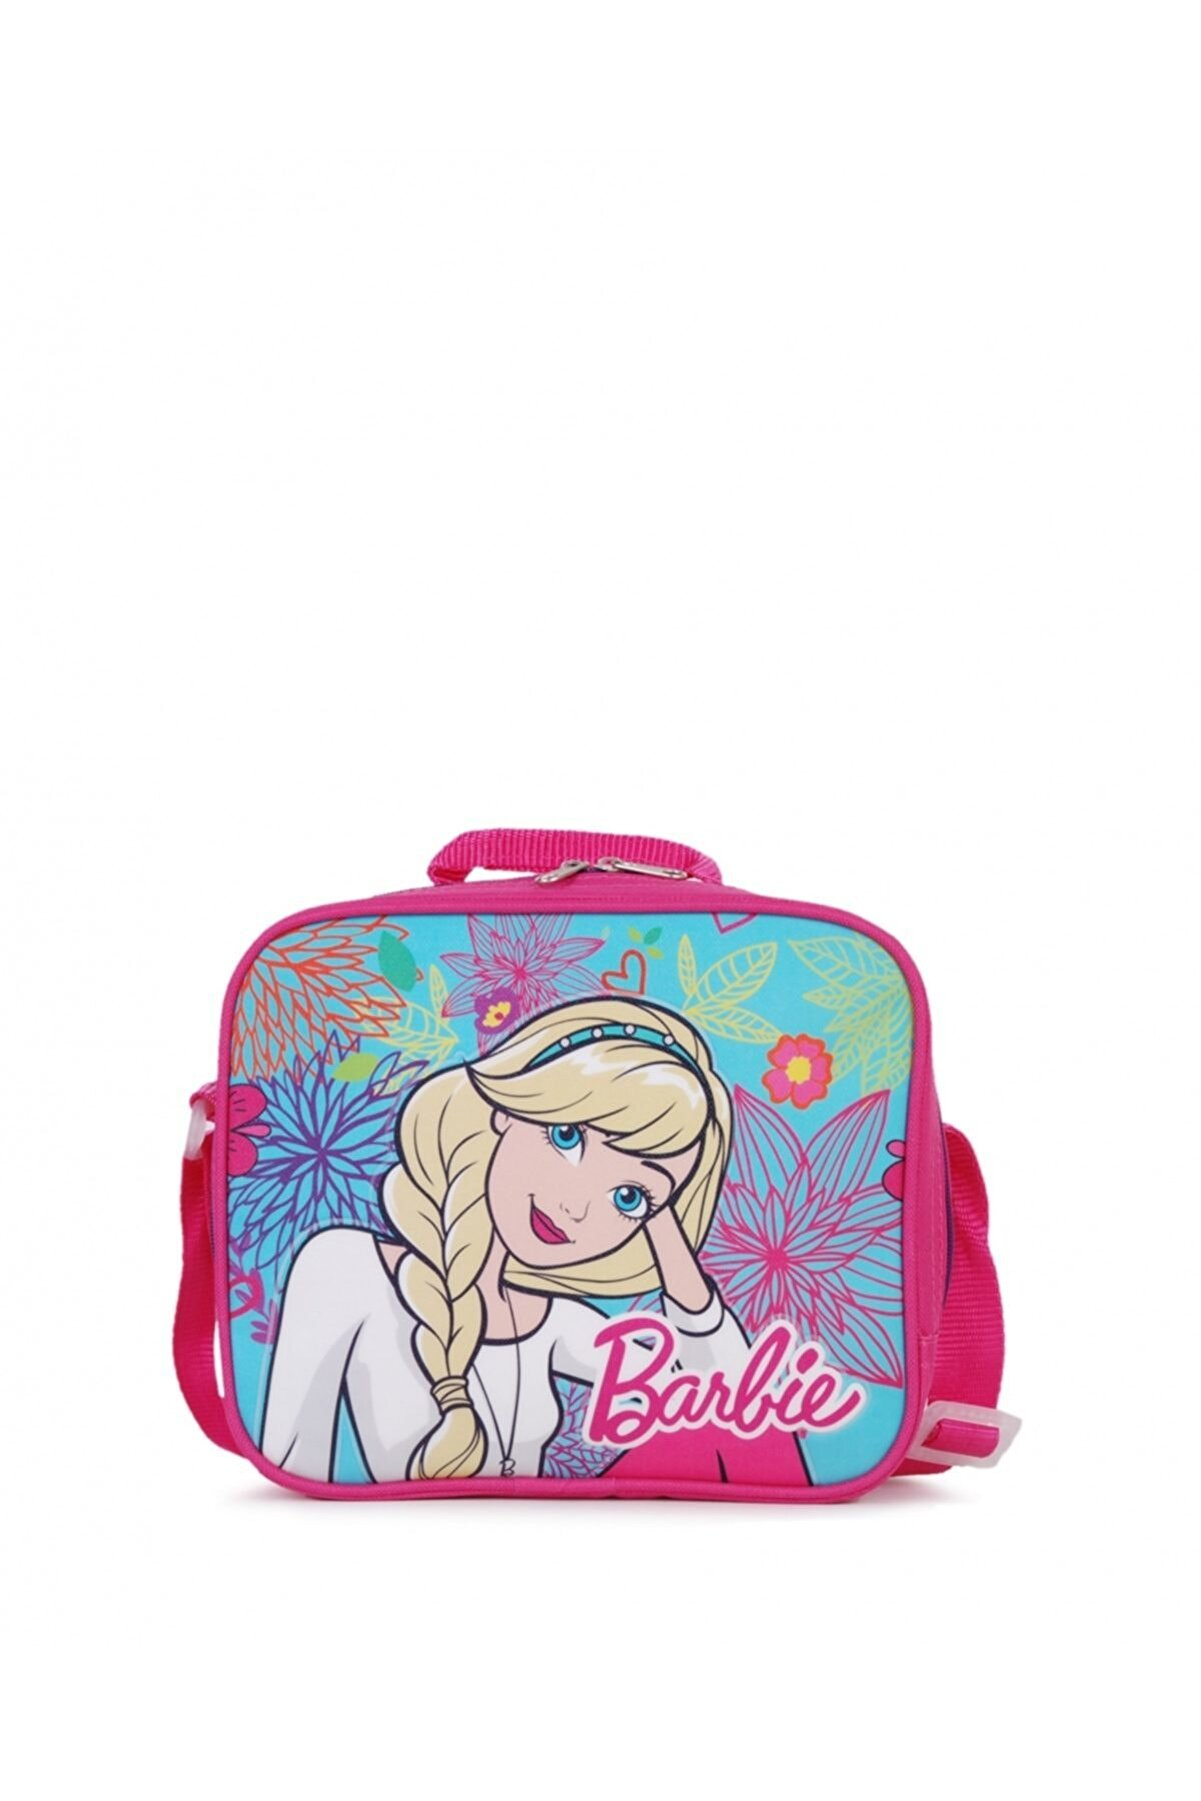 Barbie Kız Çocuk  Patterned Beslenme Çantası 96523